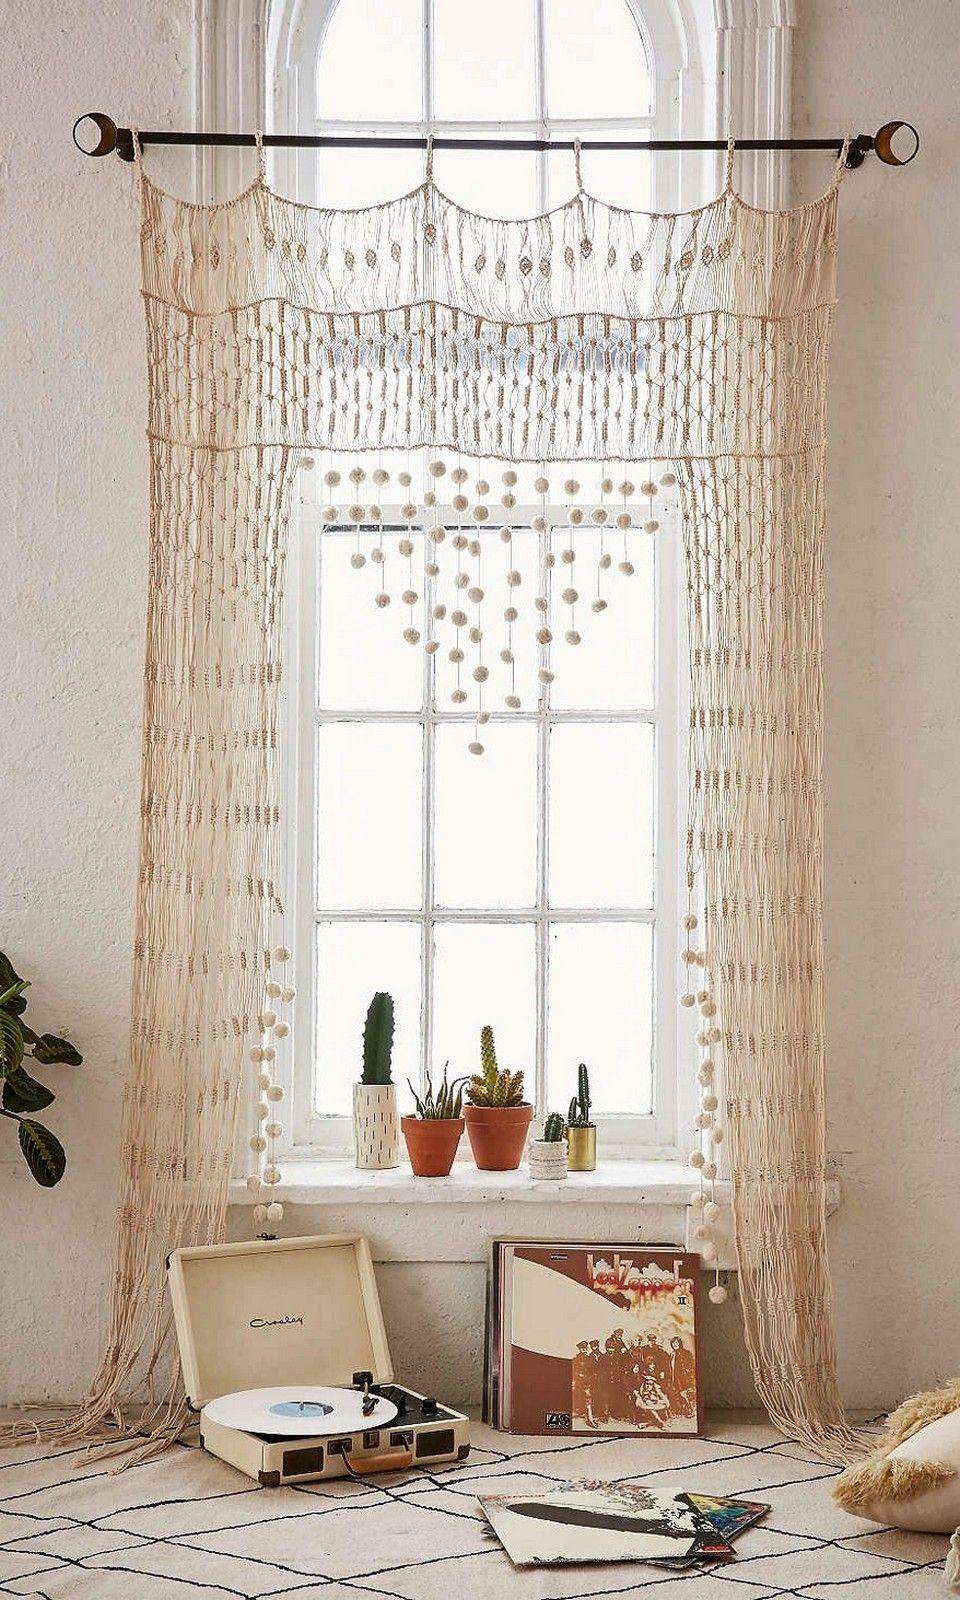 2020 Bohemian Interior Design Trends 90 Amazing Tips And Ideas Decor Home Decor Bohemian Curtains